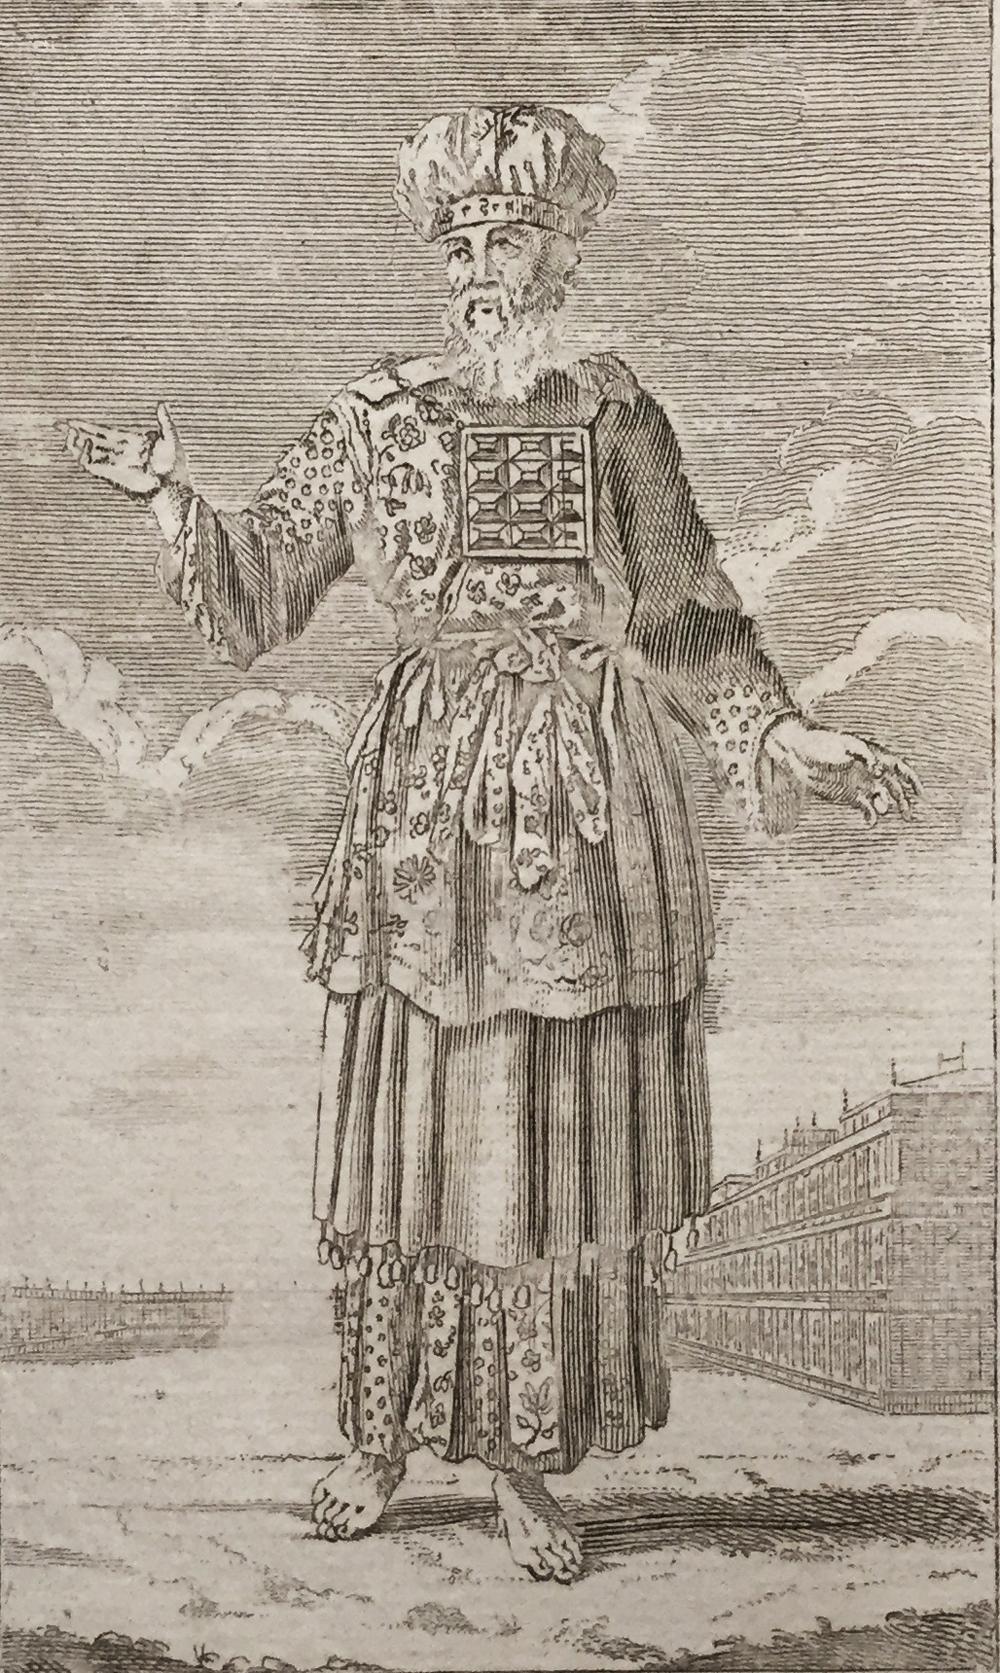 The Jewish High Priest in His Pontifical Habit